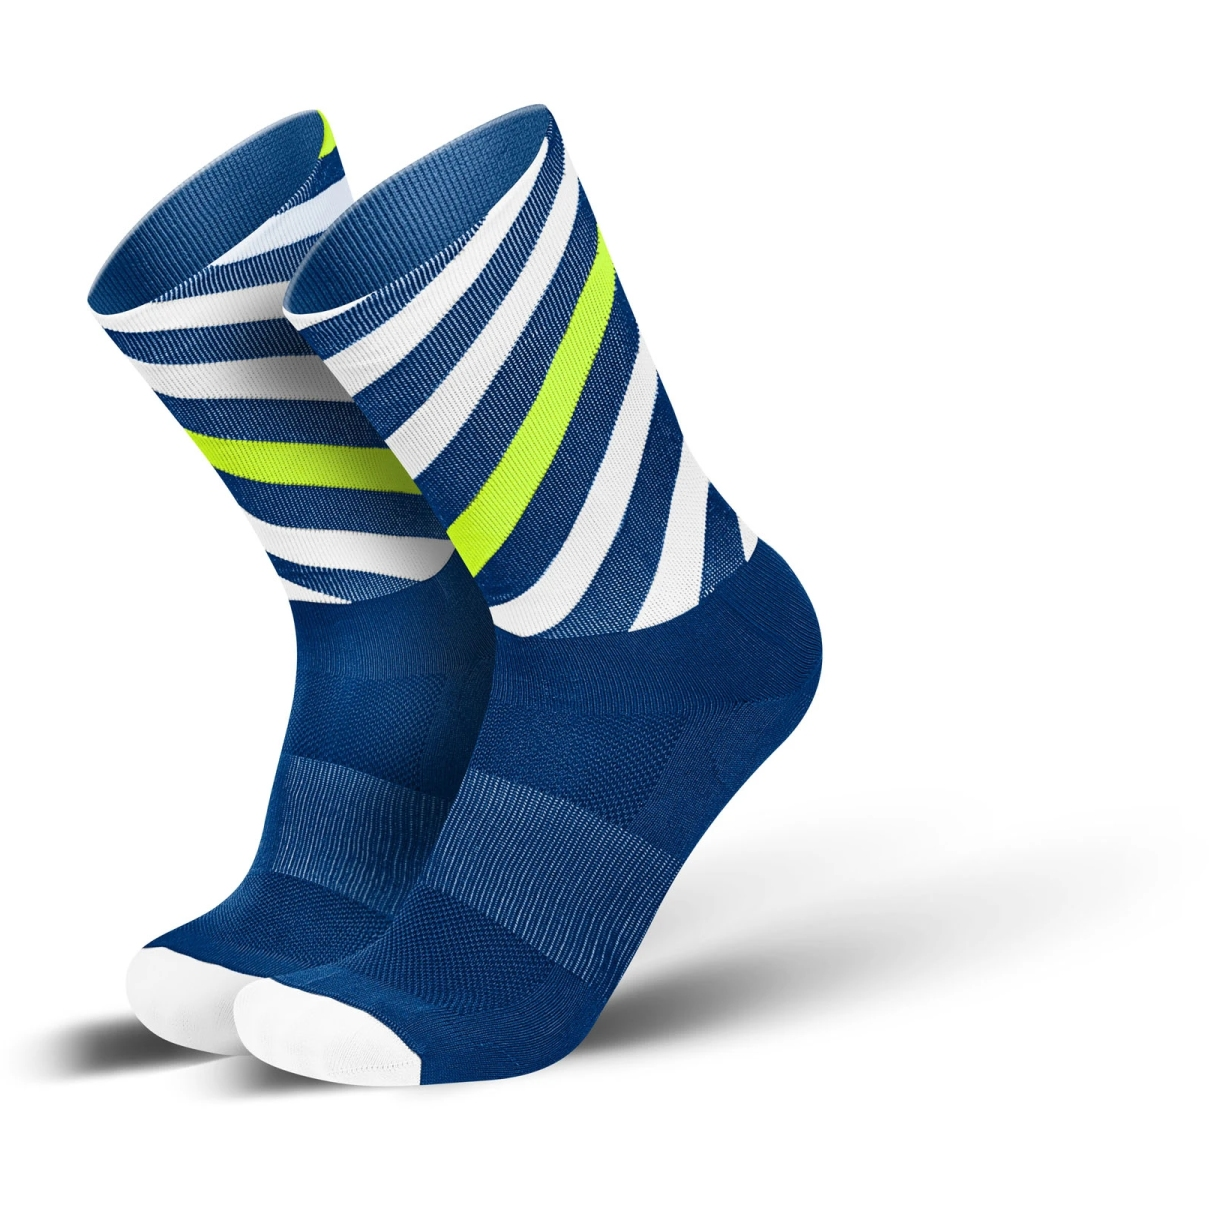 Produktbild von INCYLENCE Ultralight Curls Socken - Canary